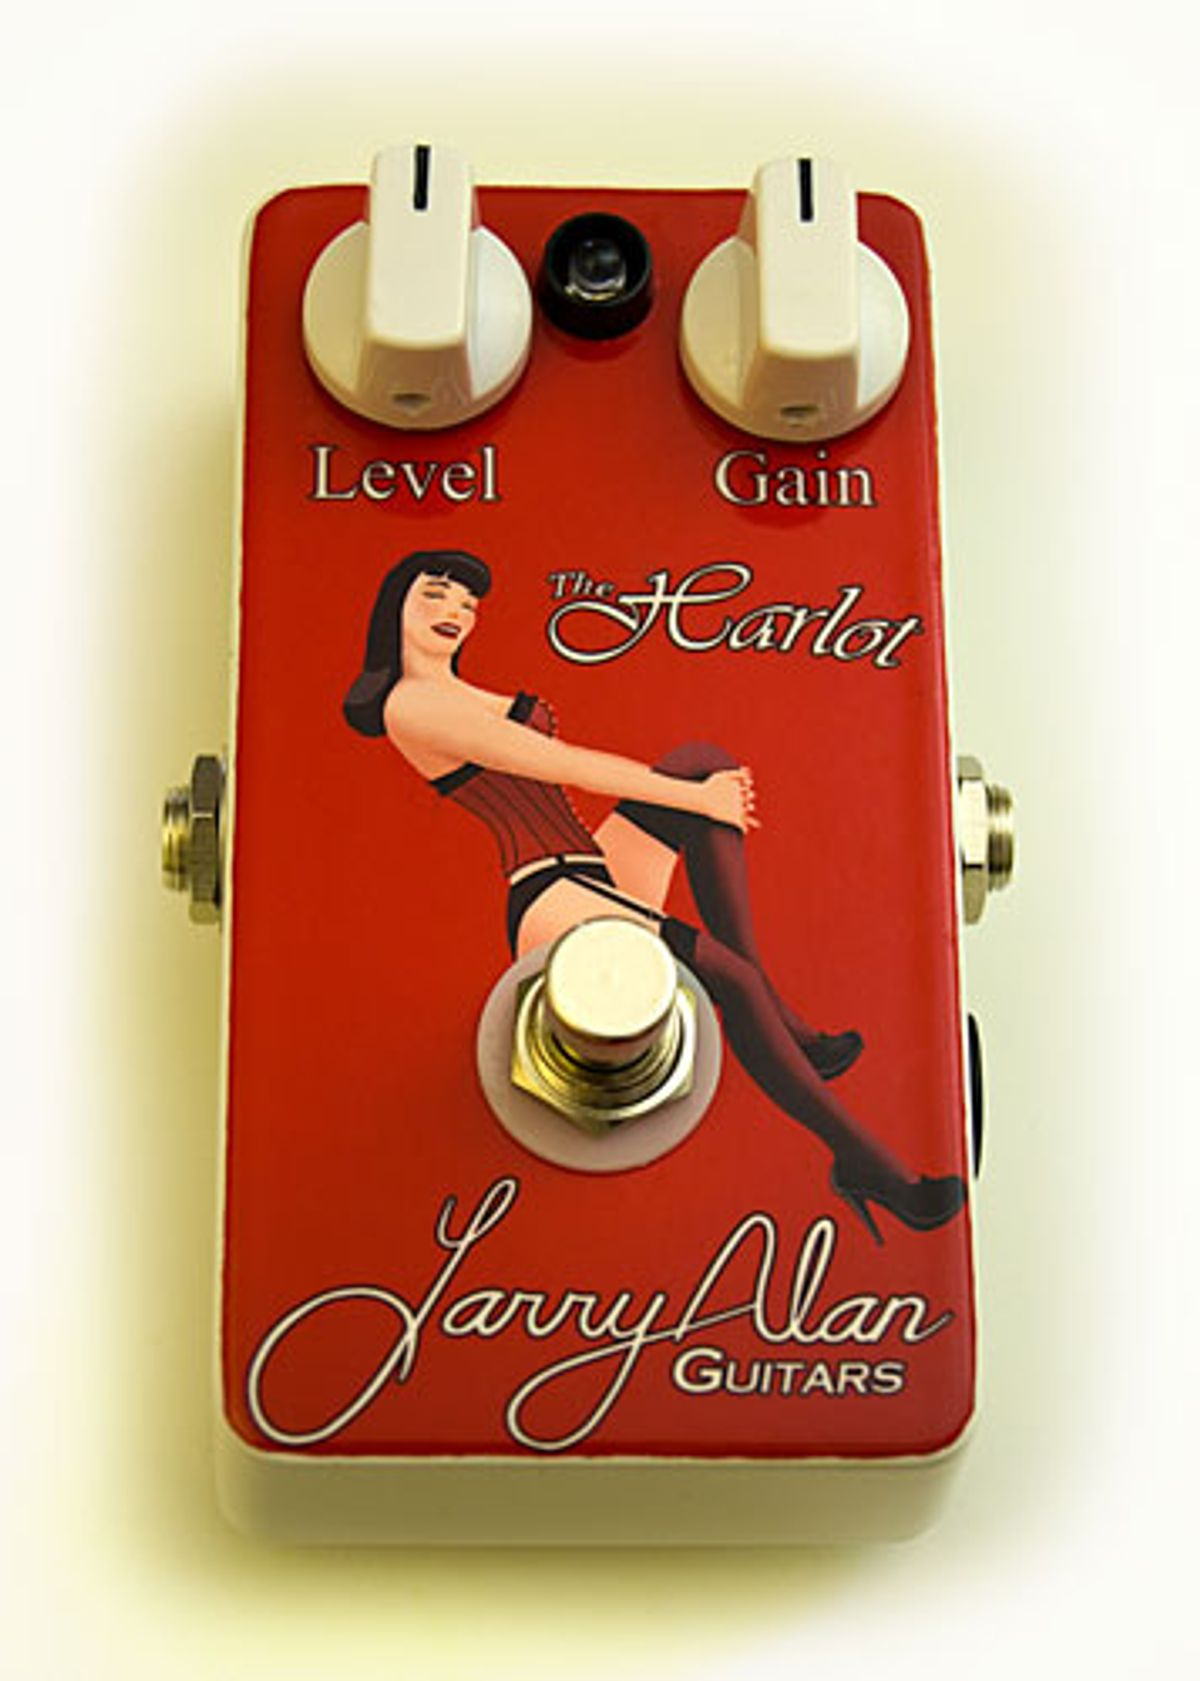 Larry Alan Guitars Announces the Harlot Overdrive Pedal